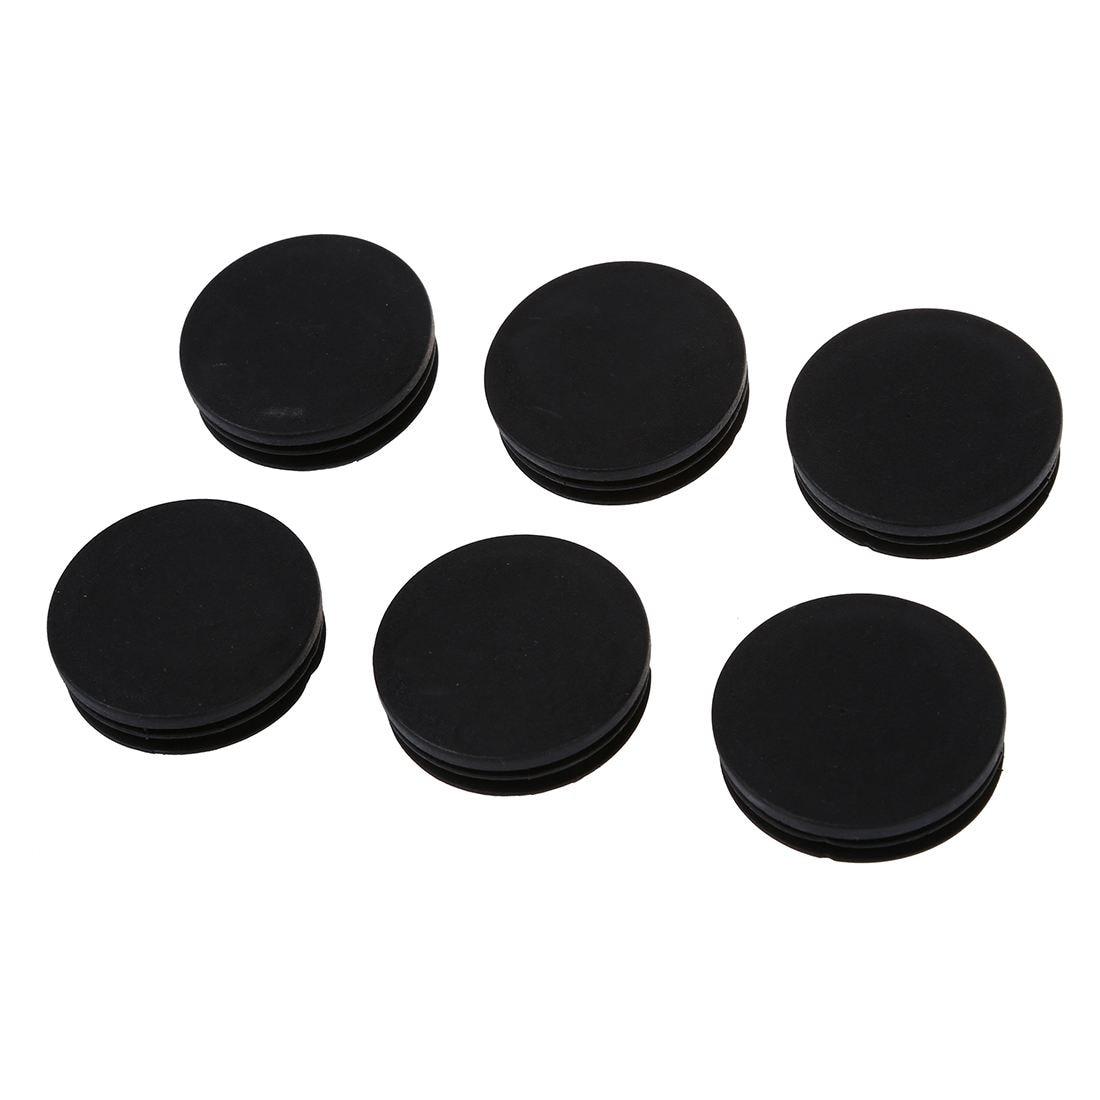 Promotion! 6 X Black Plastic 50mm Dia Round Tubing Tube Insert Caps Covers